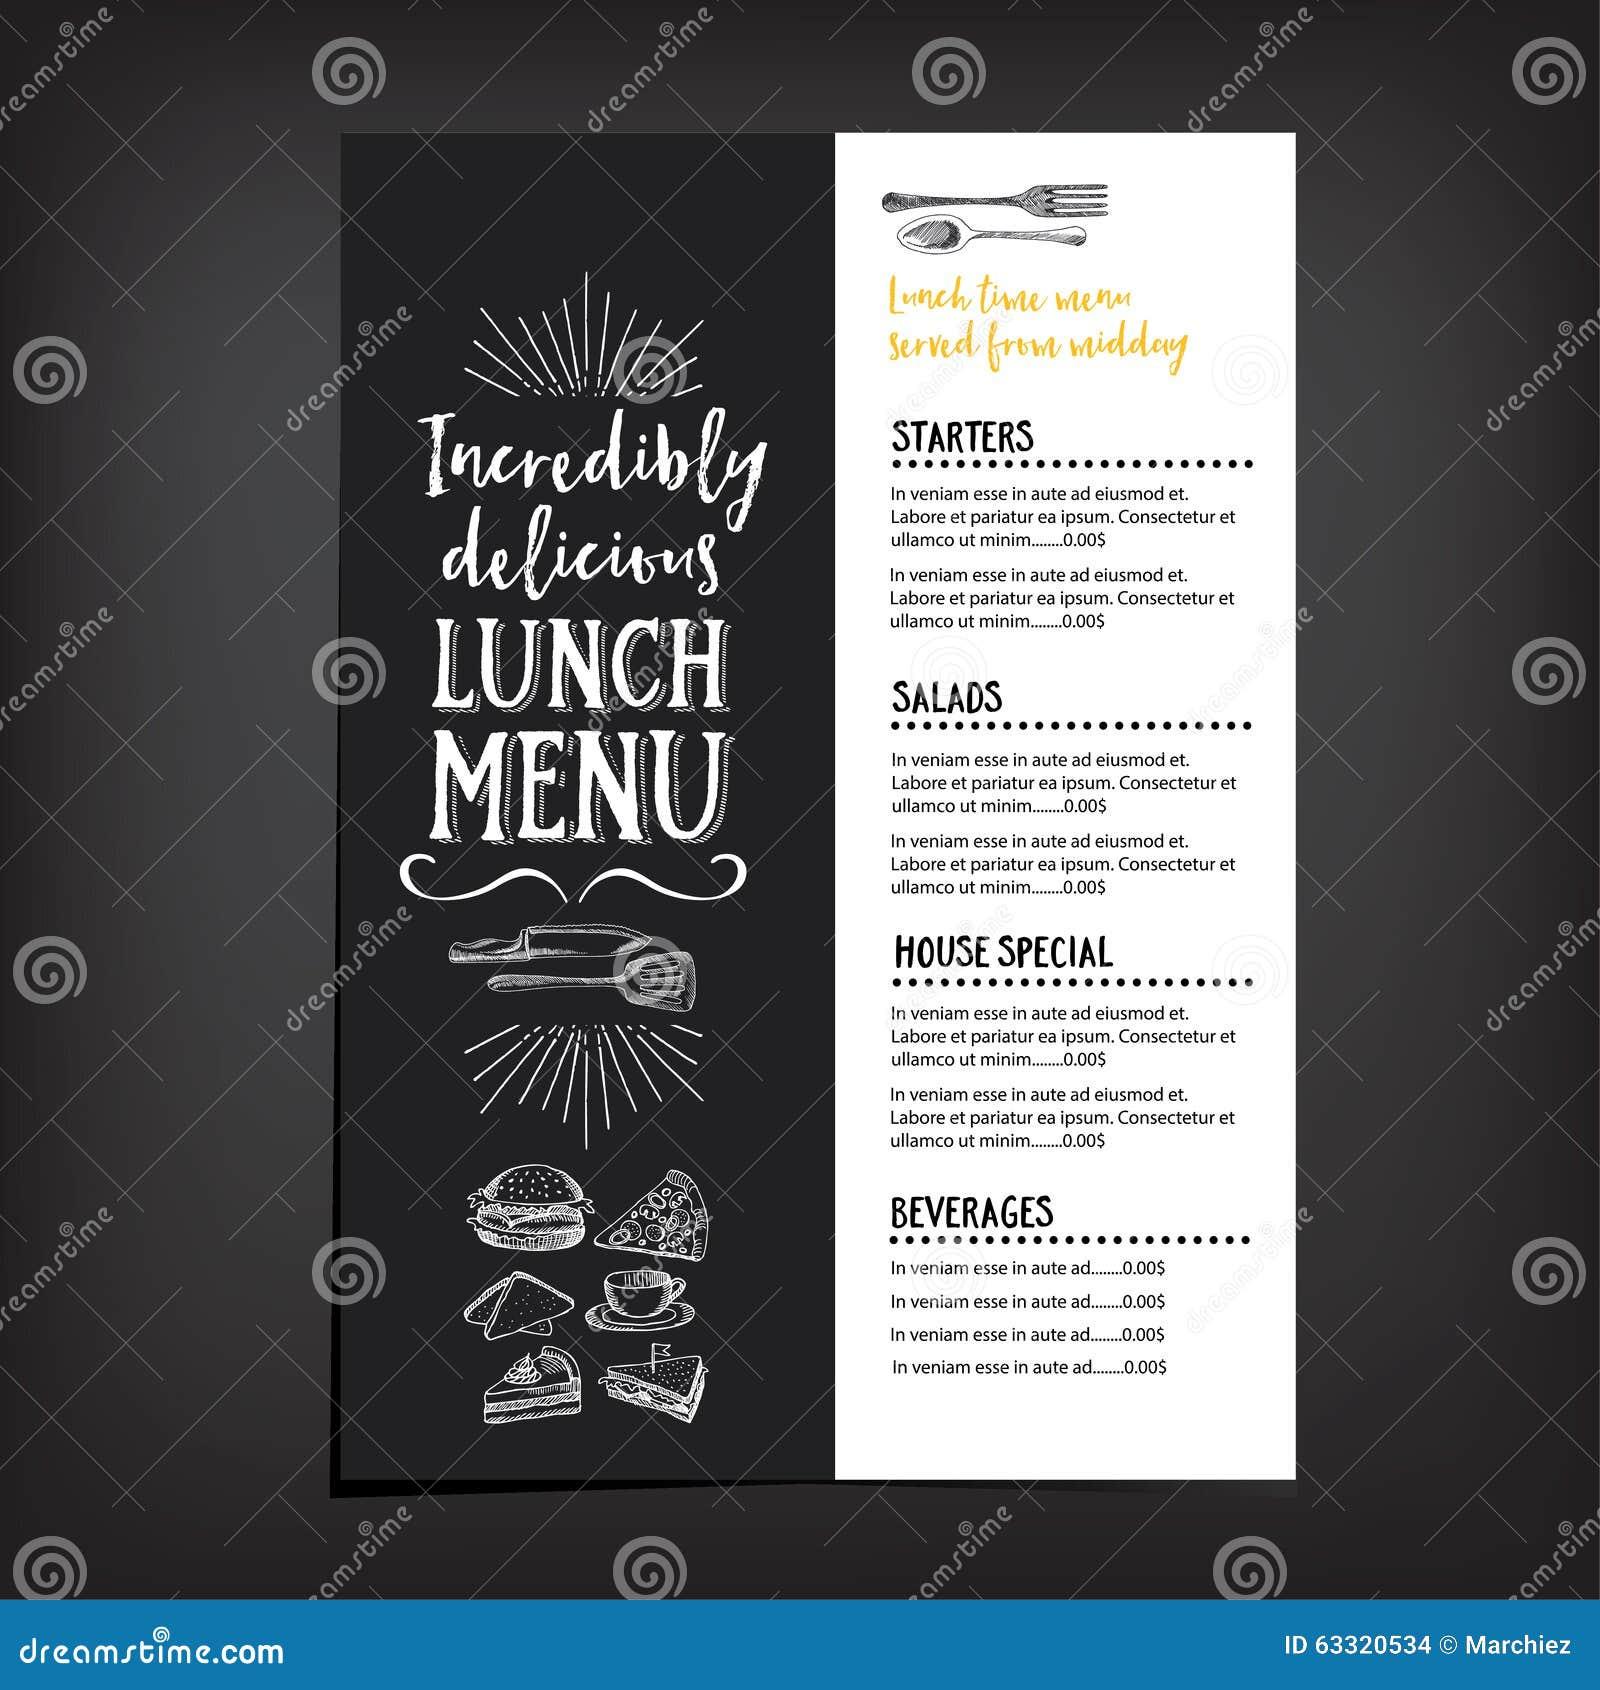 restaurant flyer design template .